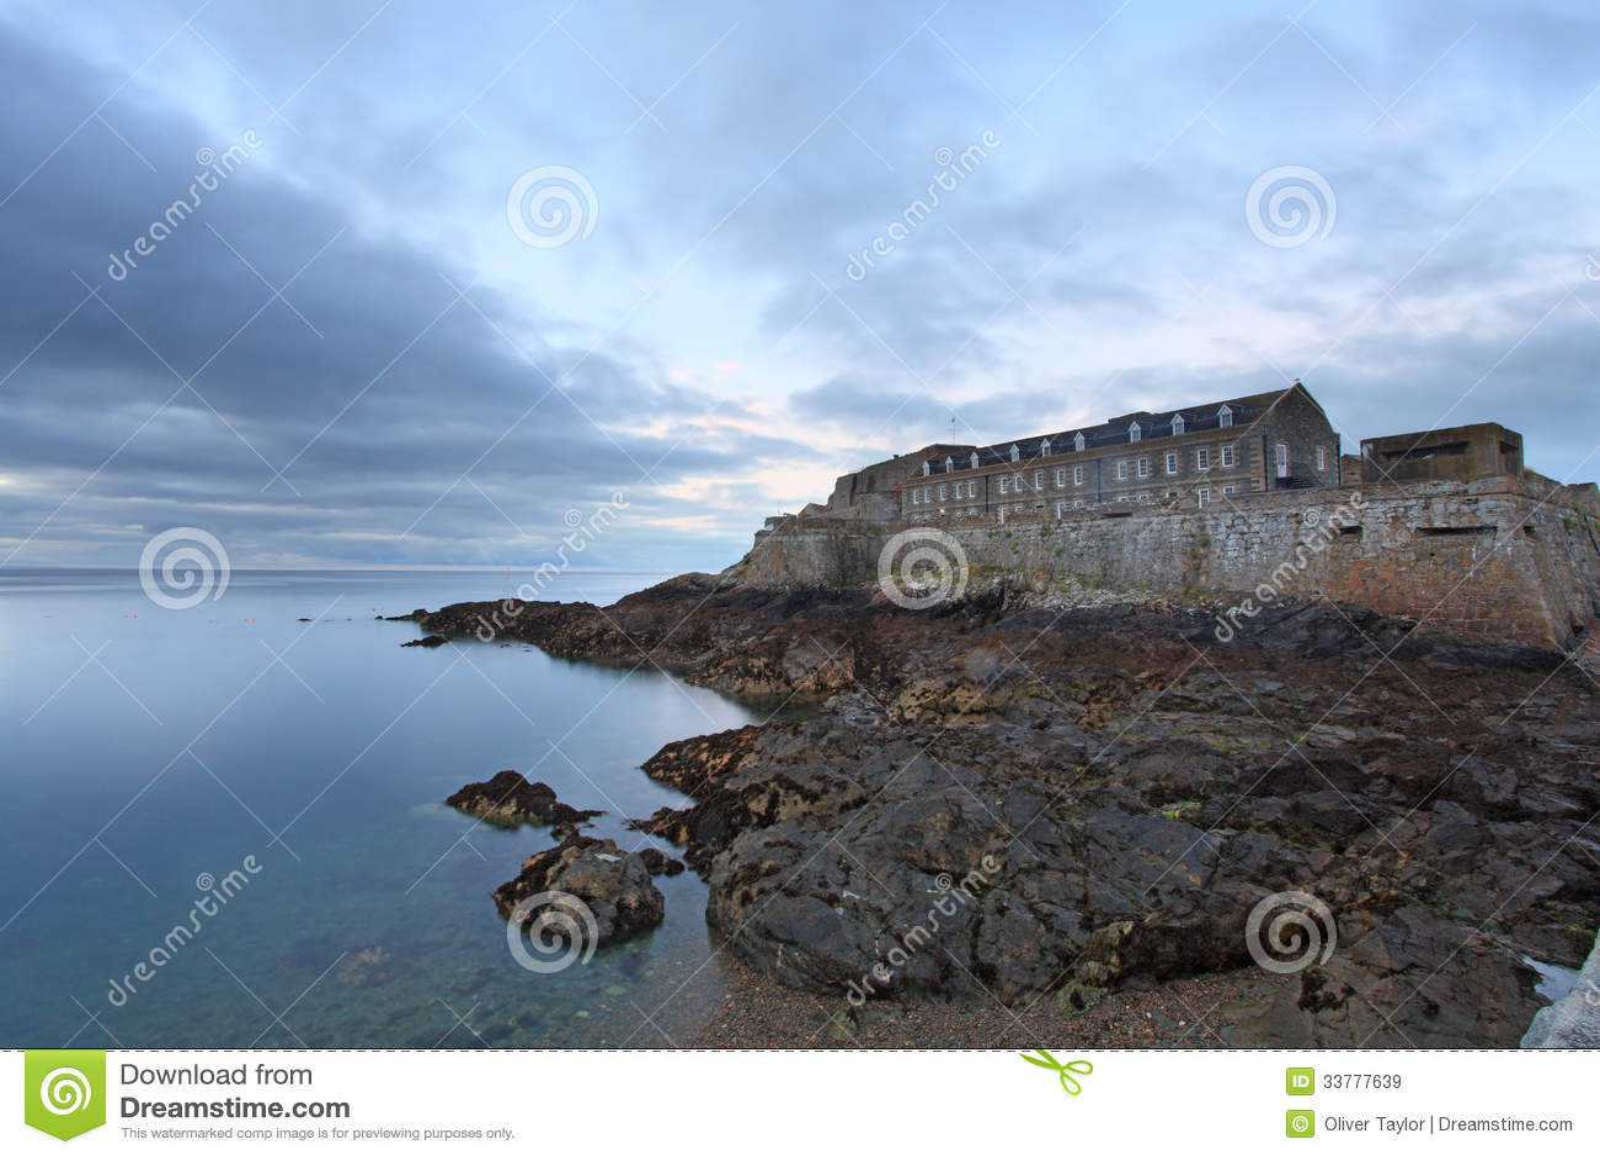 Guernsey United Kingdom  city images : Guernsey Island Cornet Castle United Kingdom Channel Island.